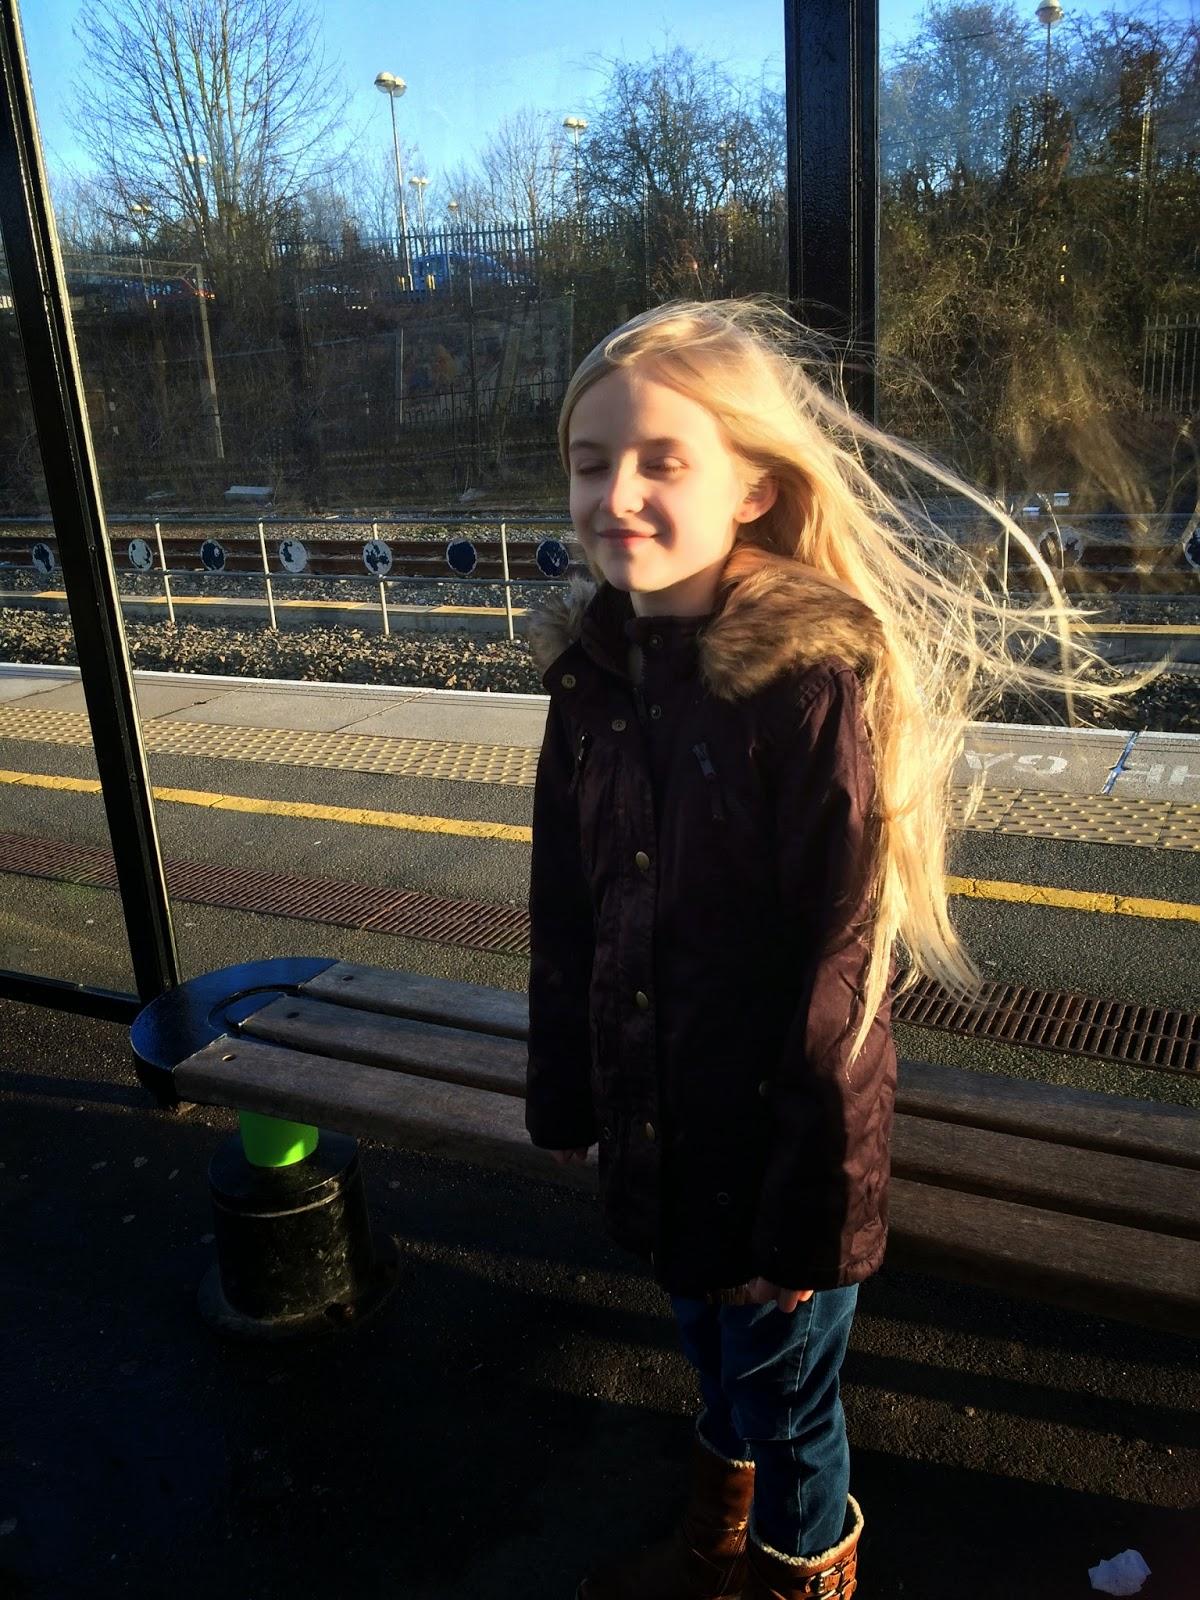 8-yr-old wearing purple parka from Morrisons Nutmeg clothing range